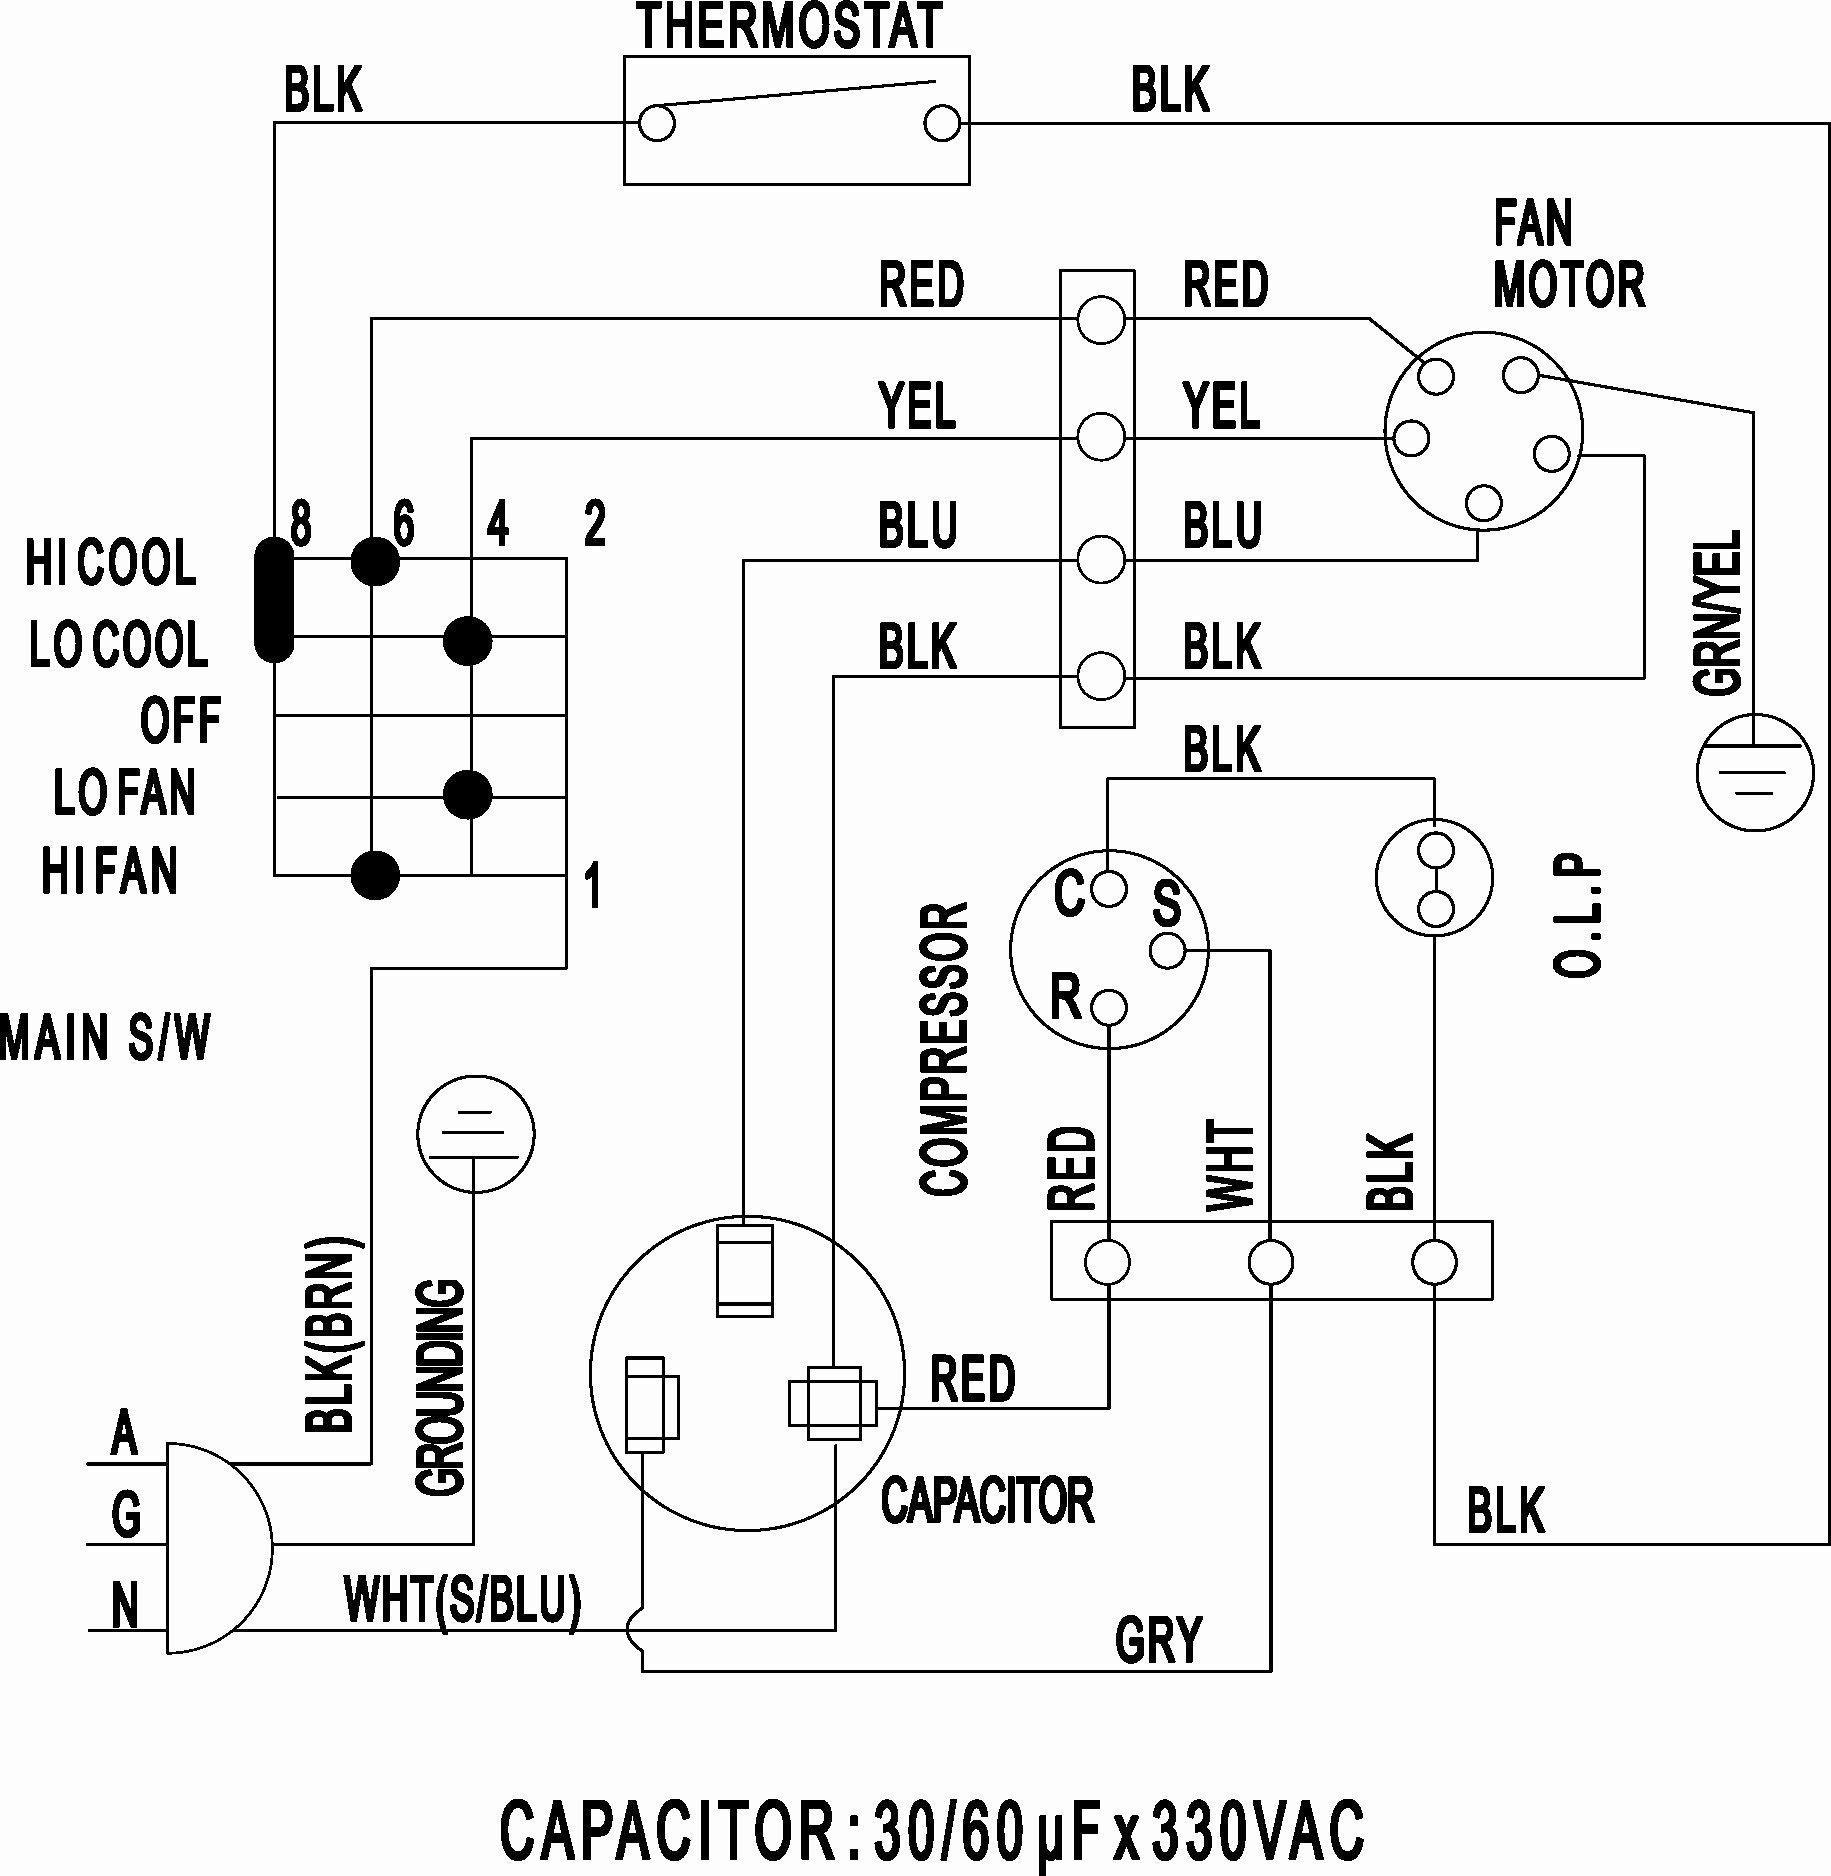 Generator Motor Wiring Diagram - Wire Toggle Switch Wiring Diagram 3 | Bege Wiring  Diagram | Winch Motor Wiring Diagram For Generator |  | Bege Wiring Diagram